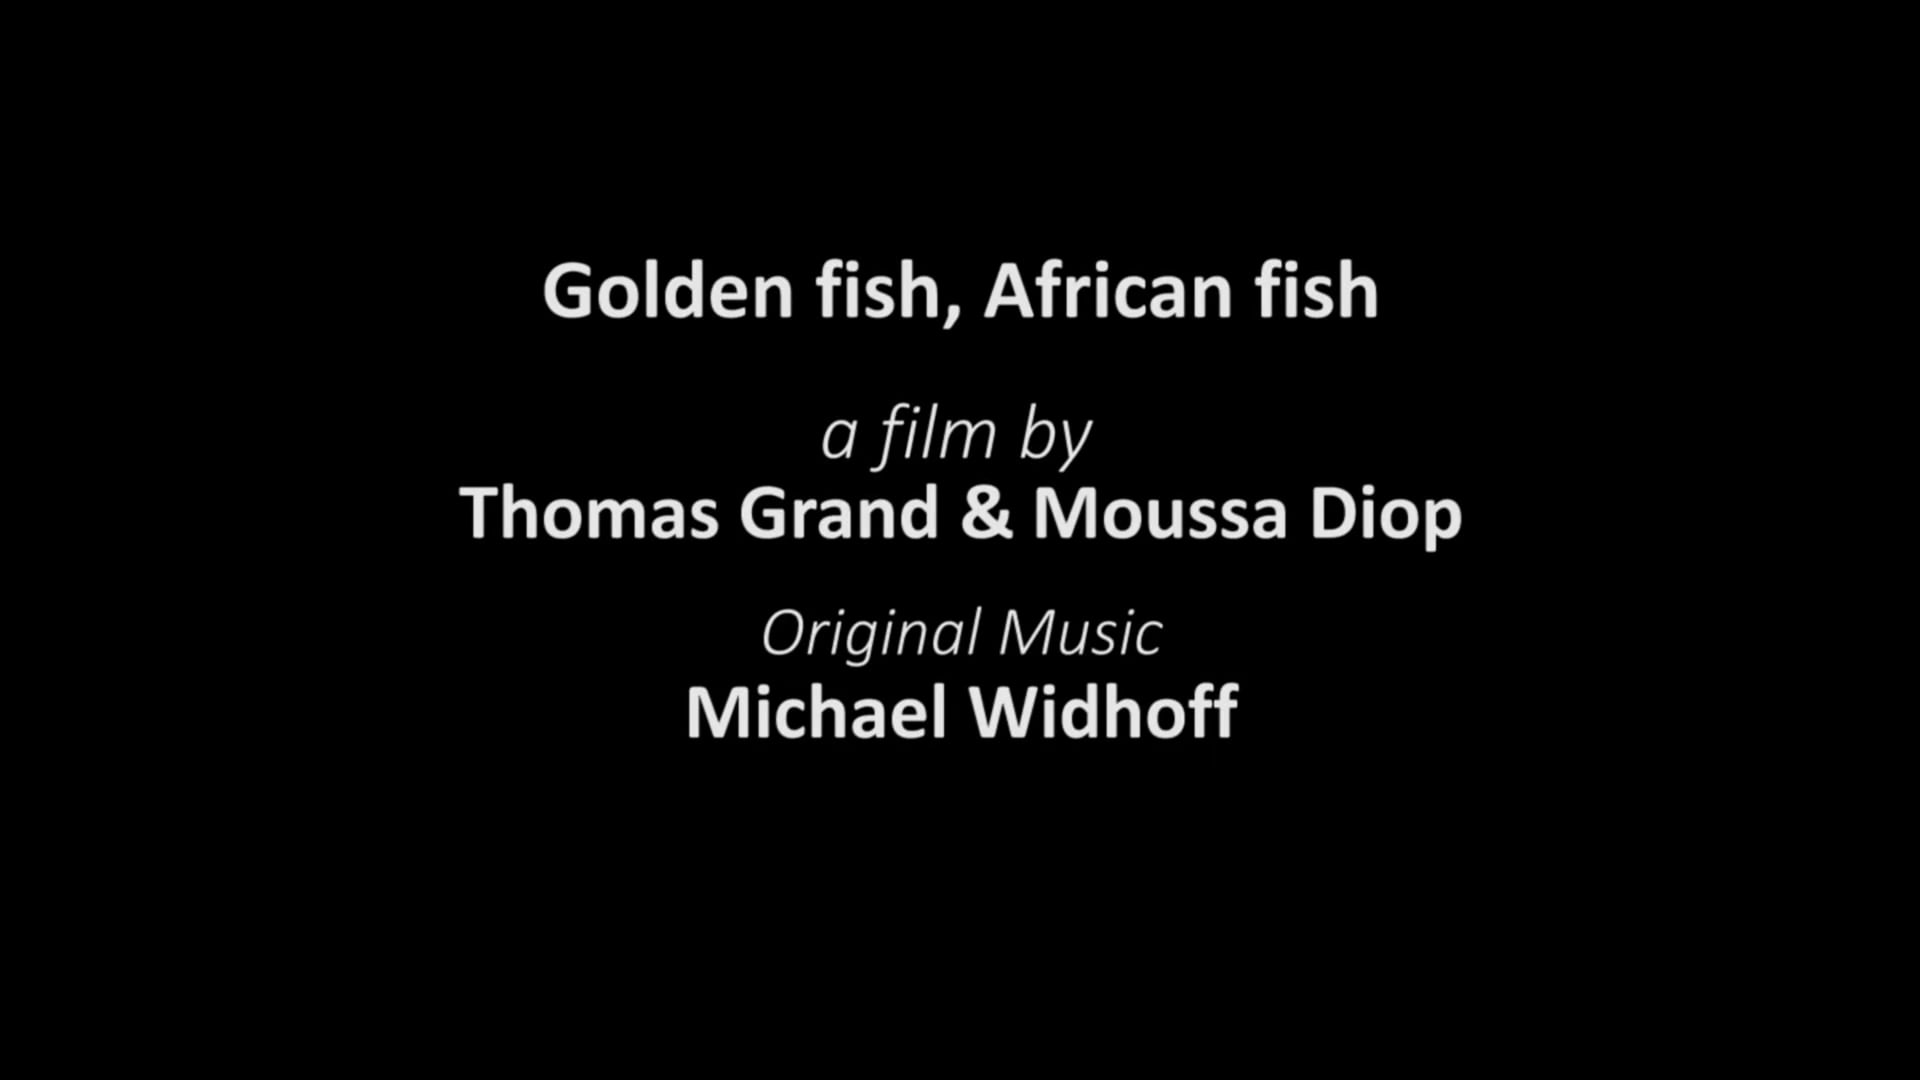 TRAILER GOLDEN FISH AFRICAN FISH